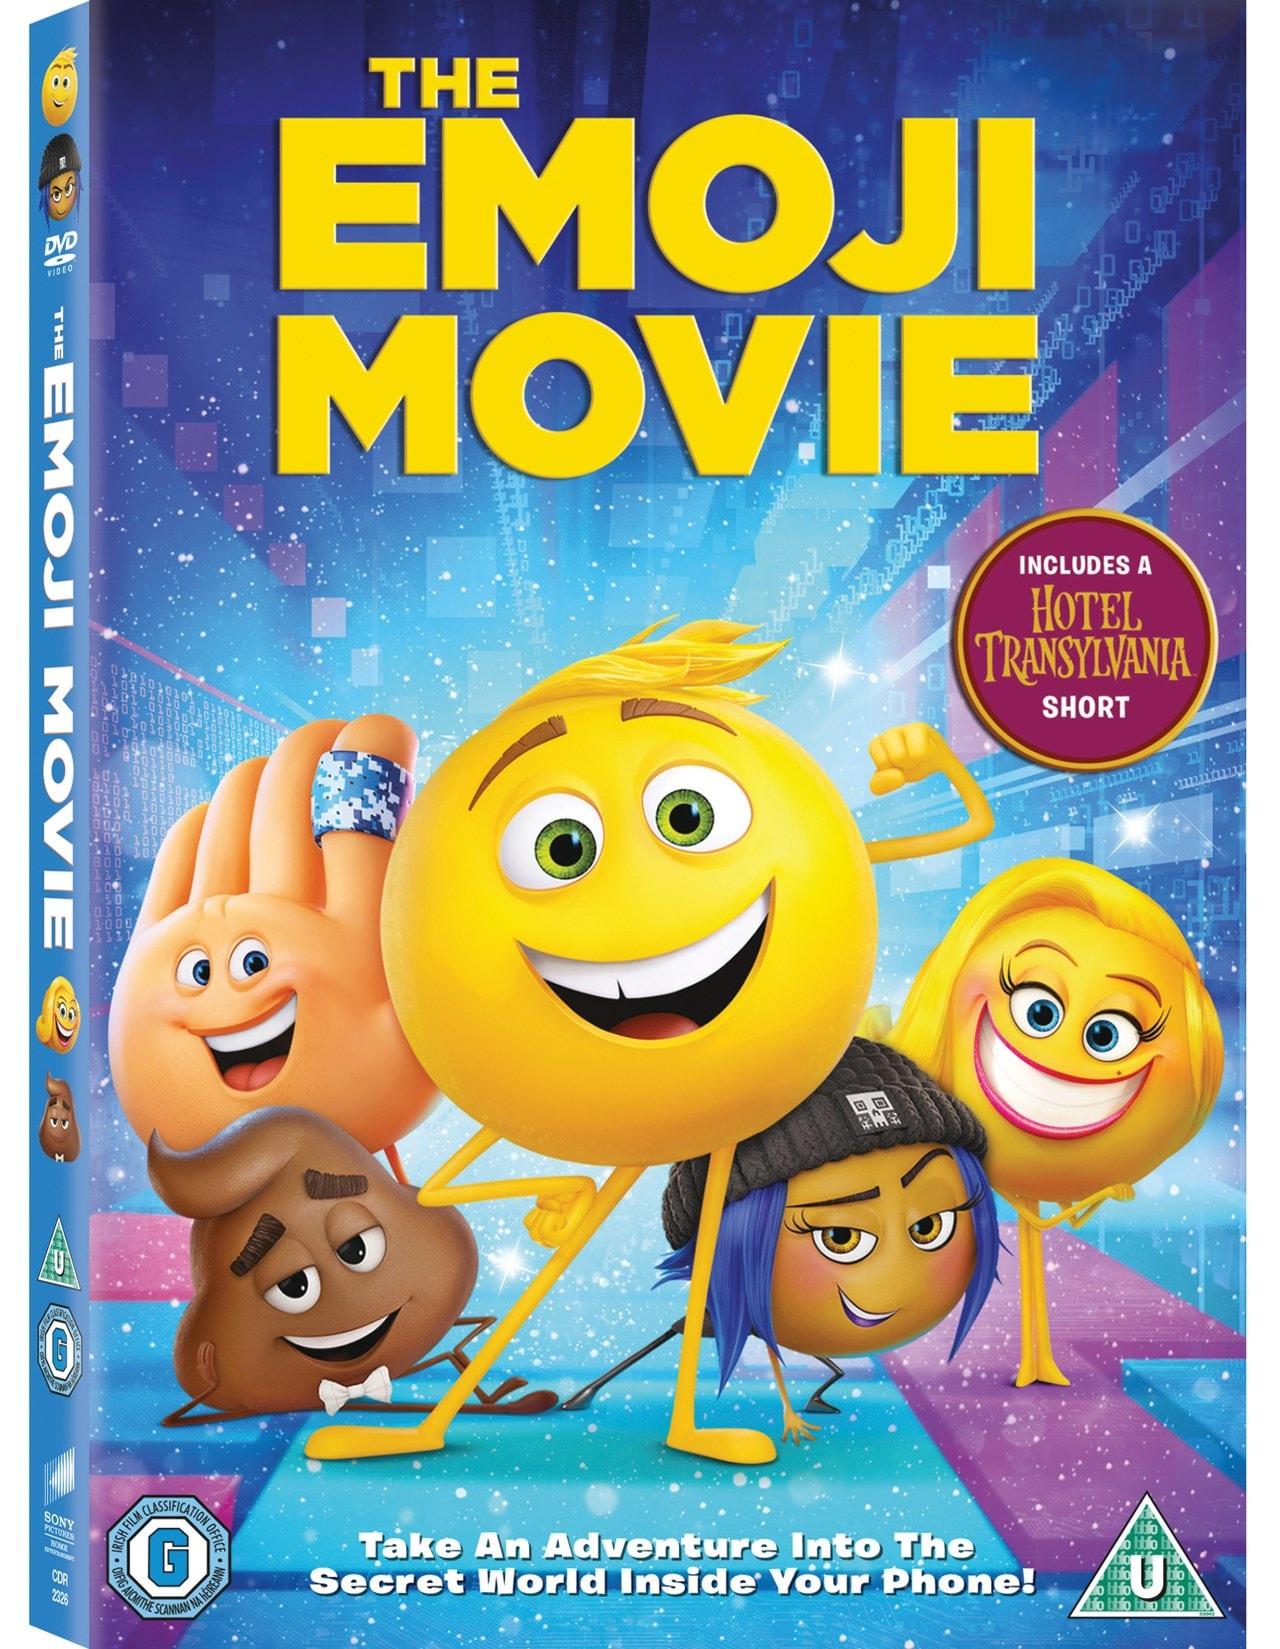 The Emoji Movie - 2